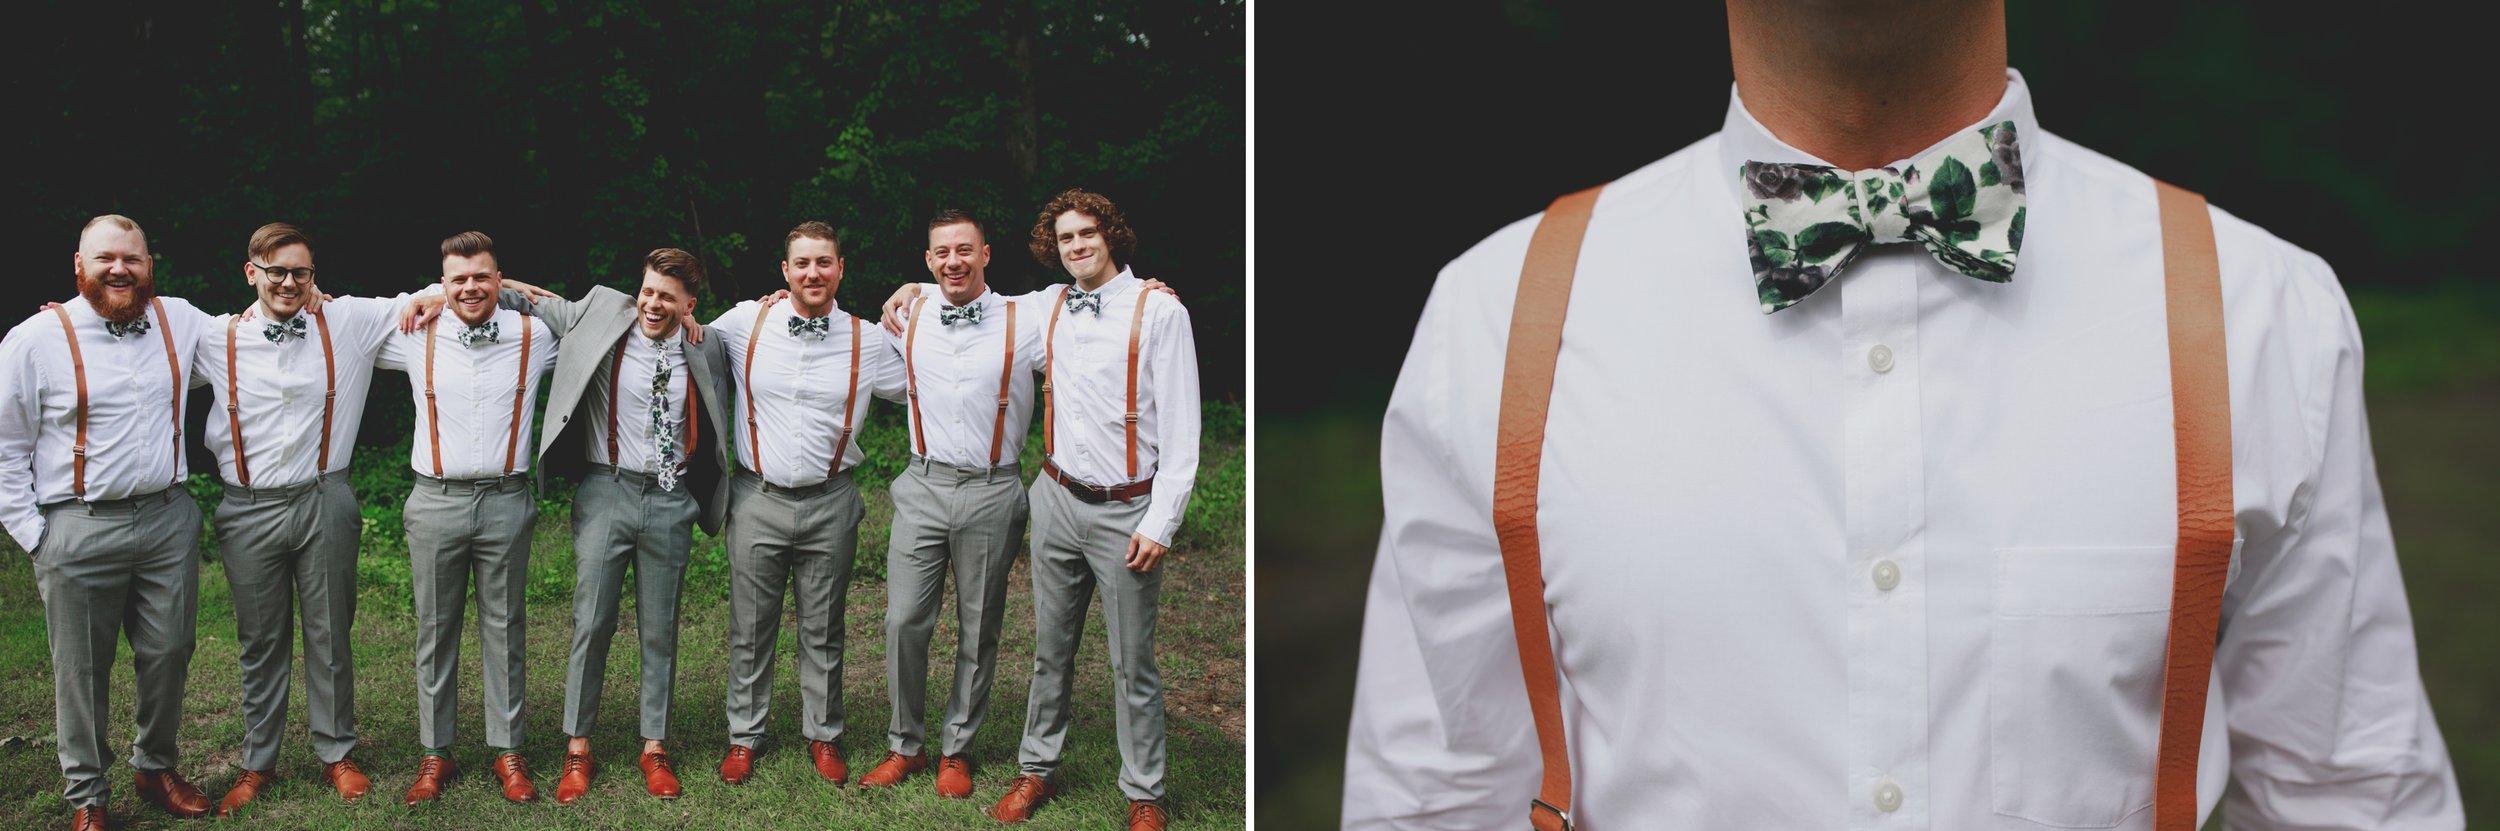 amanda_vanvels_michigan_camp_wedding_058.jpg